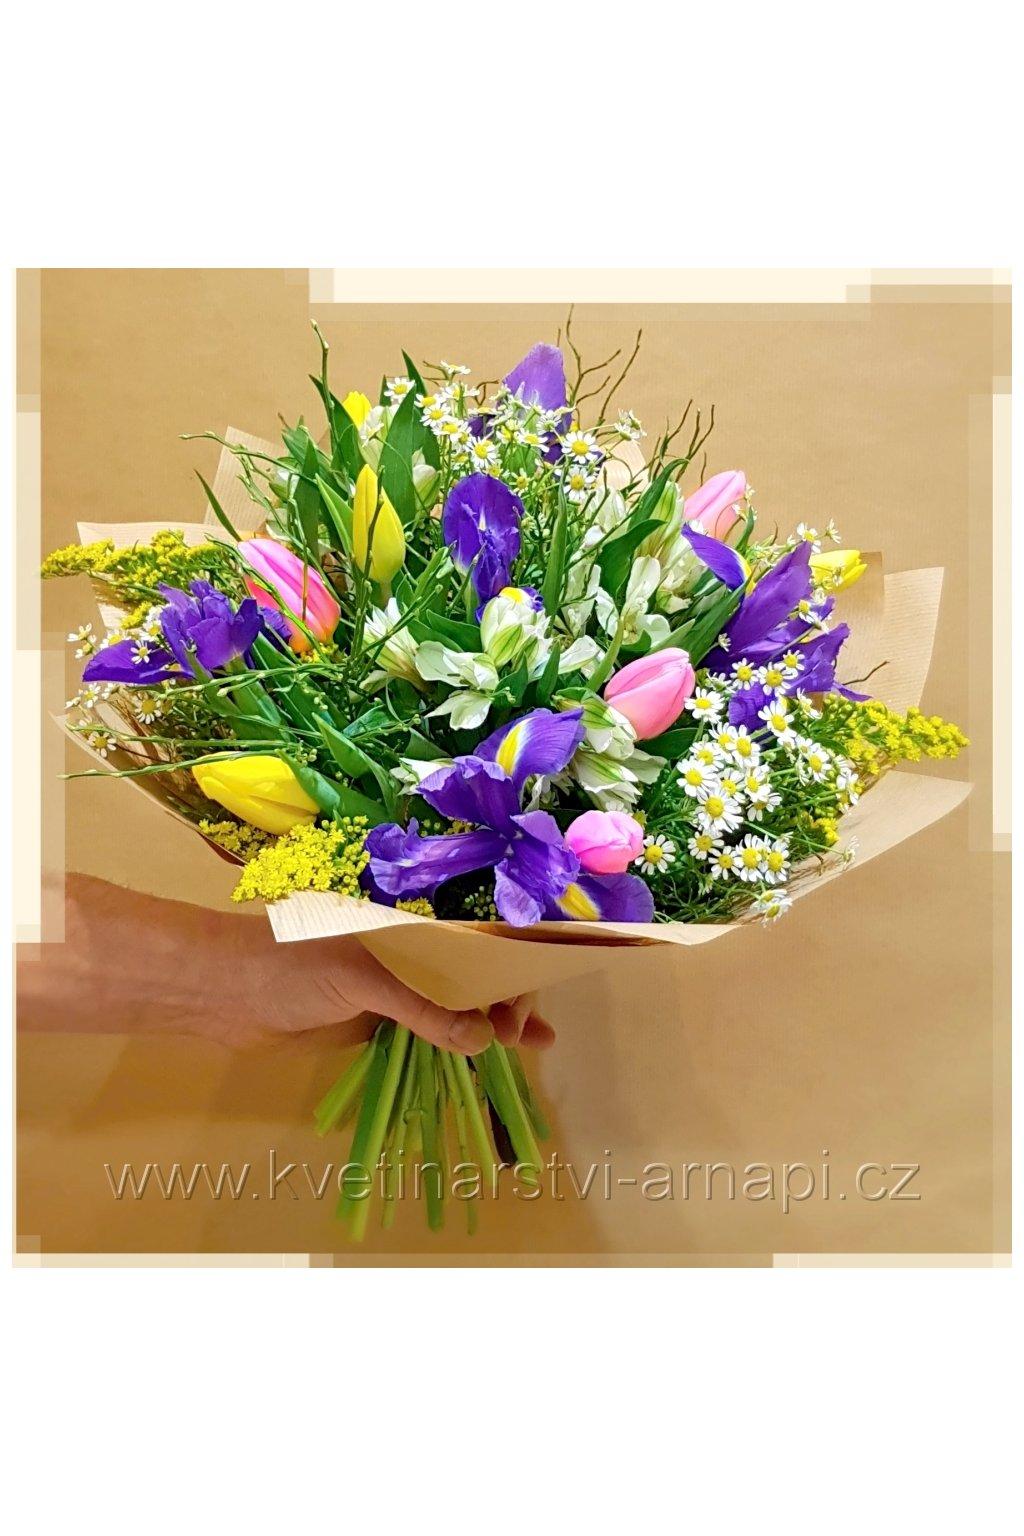 jarni kytice kvetinarstvi arnapi praha rozvoz